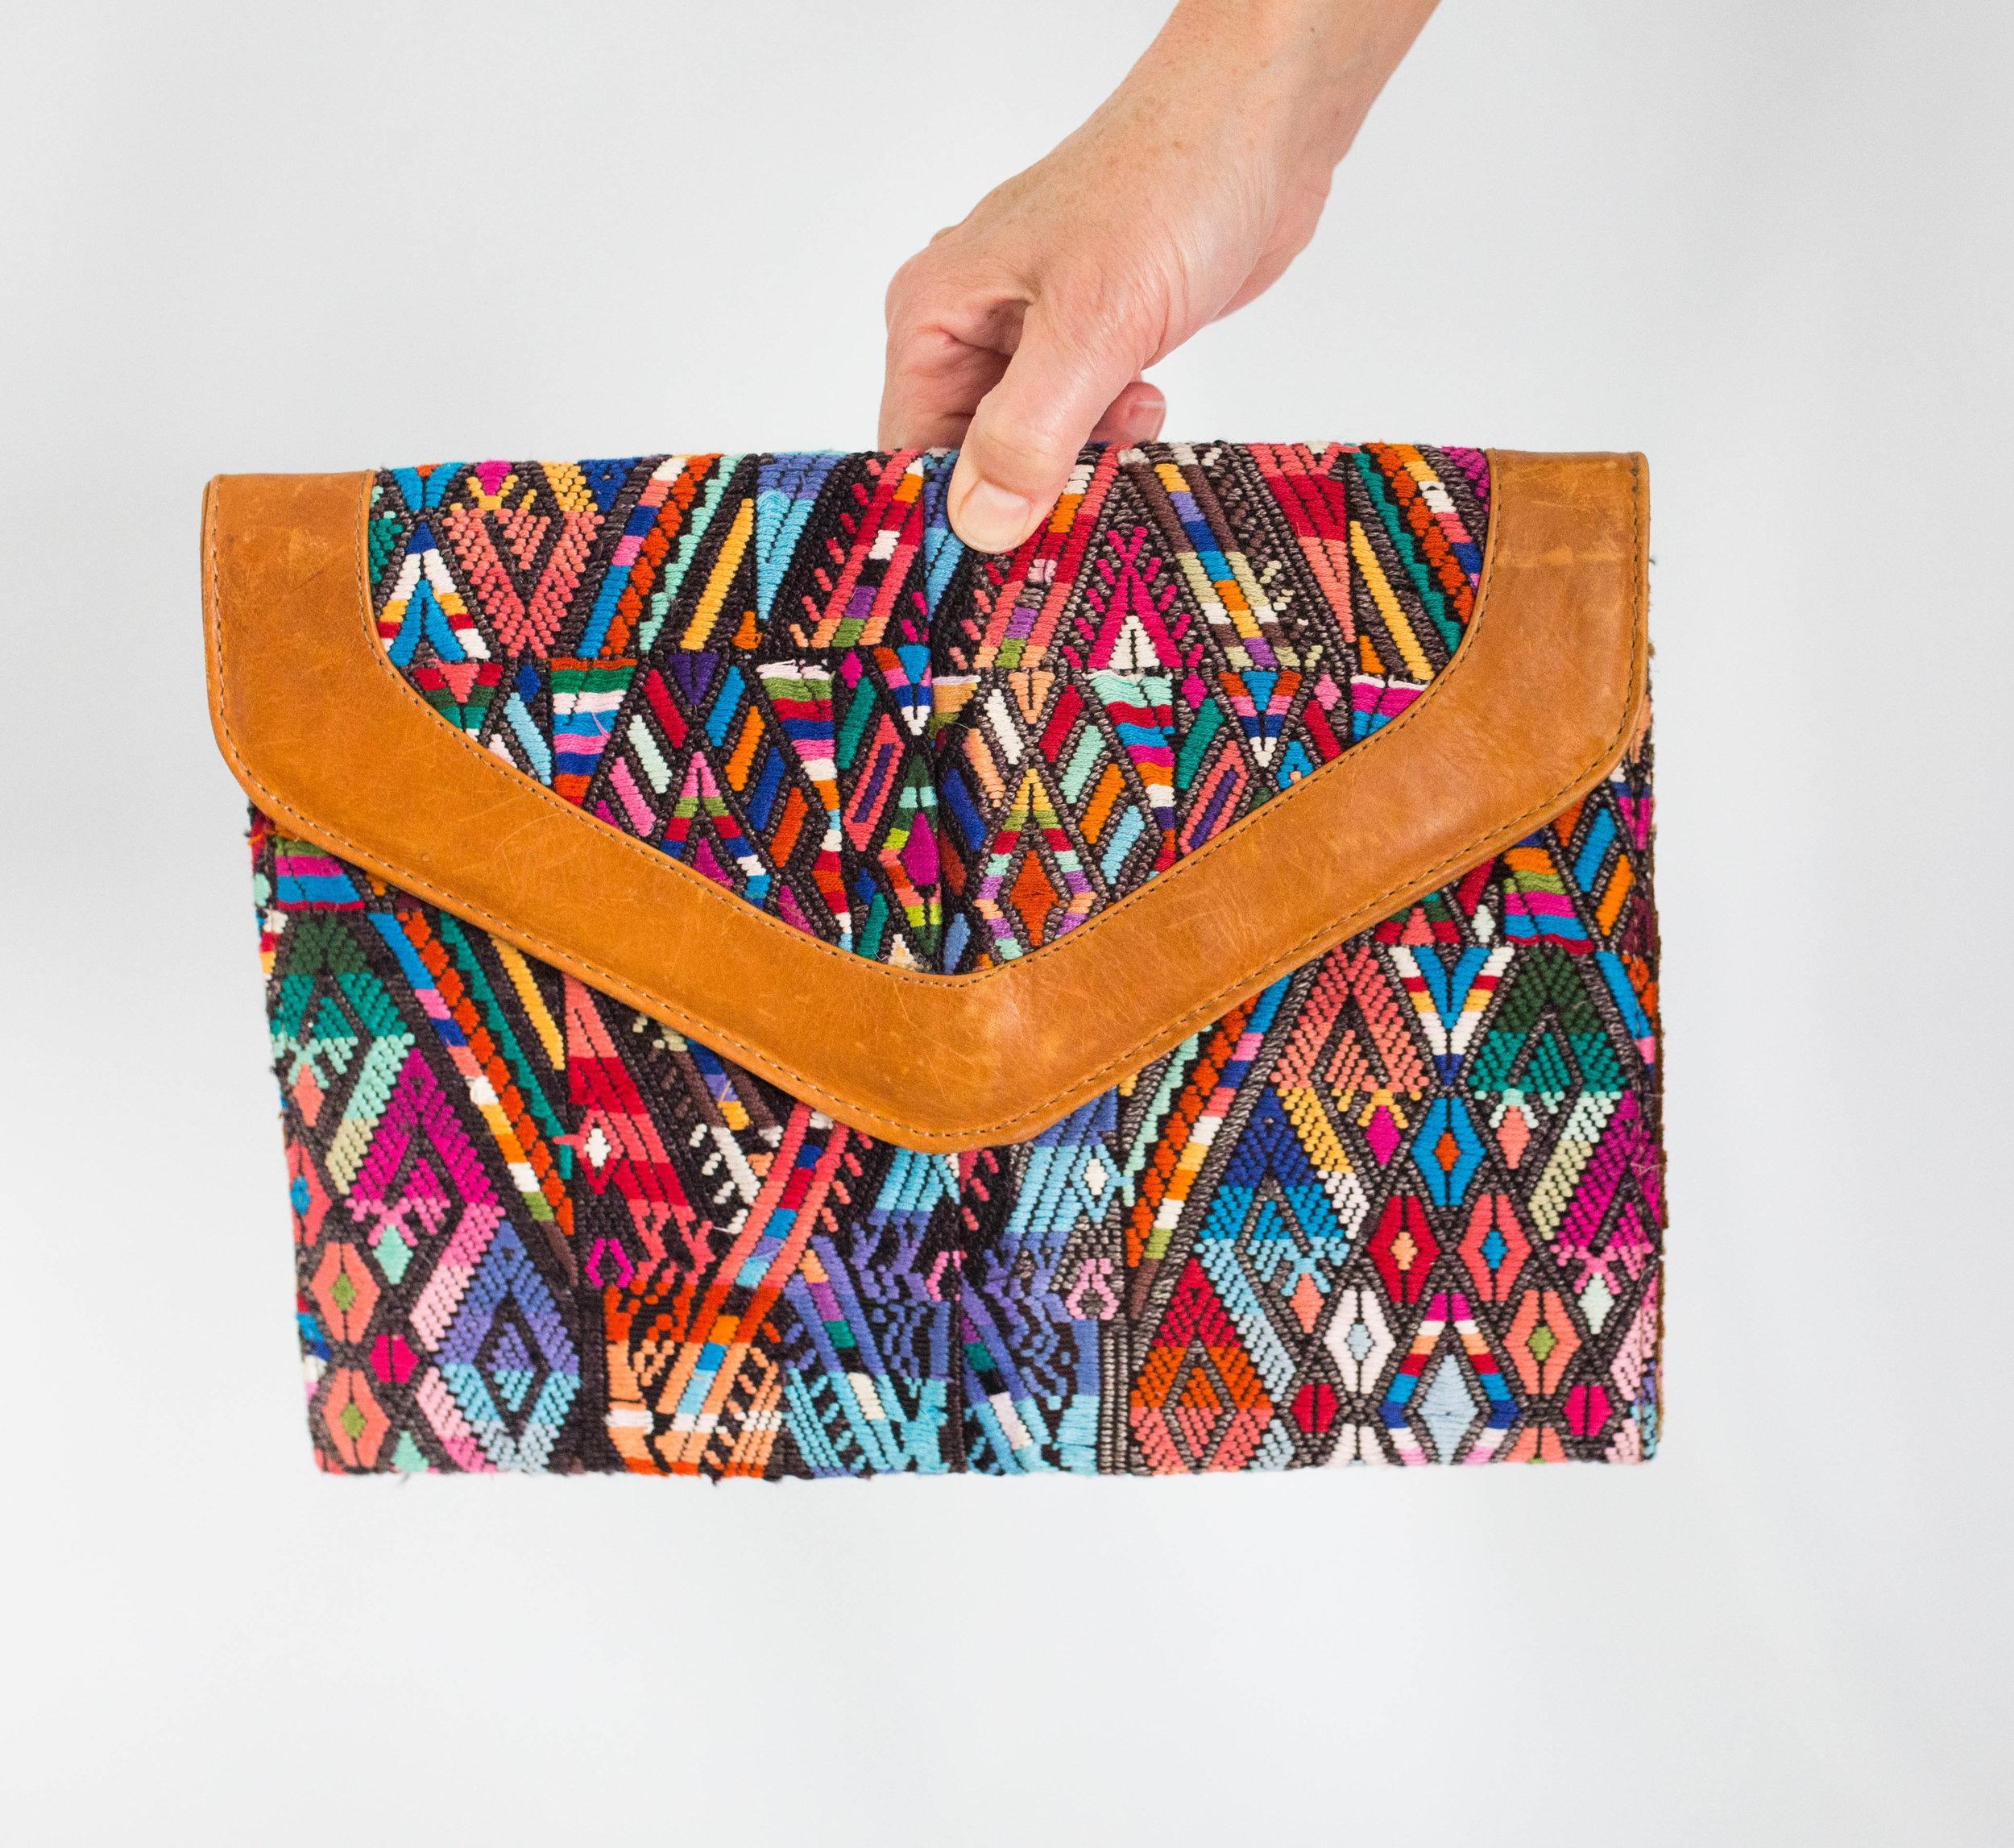 Hazlo Handmade Guatemala Fair Trade Hand Woven Leather Bags Accessories Belts Antigua Slow Fashion Purse Jewelry1808.jpg